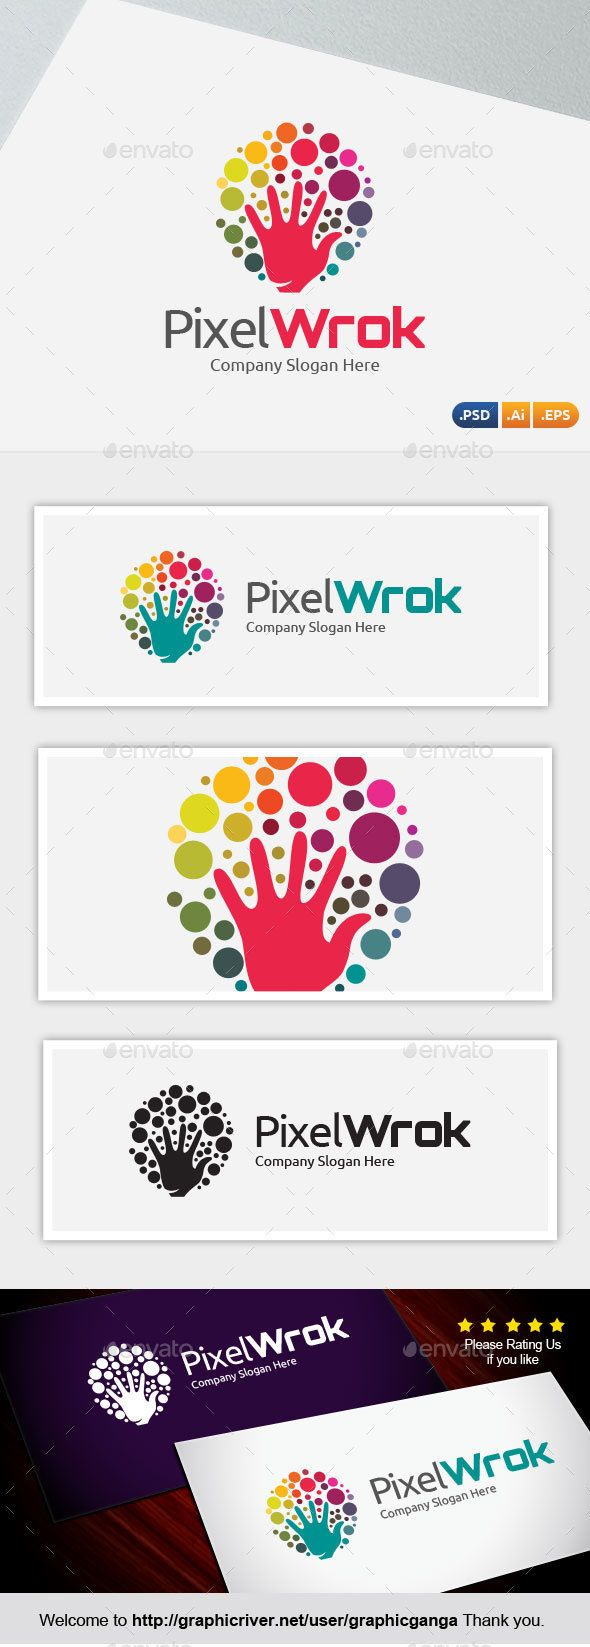 Pixel Work Logo Template PSD, Vector EPS, AI #logotype Download: http://graphicriver.net/item/pixel-work/14491431?ref=ksioks